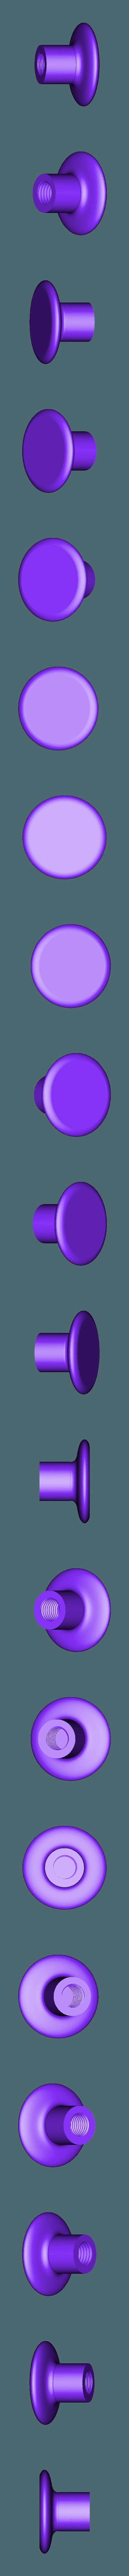 Nut.stl Download free SCAD file Perpetual Flip Calendar (W/ Customizable Font) • 3D printable model, Dsk